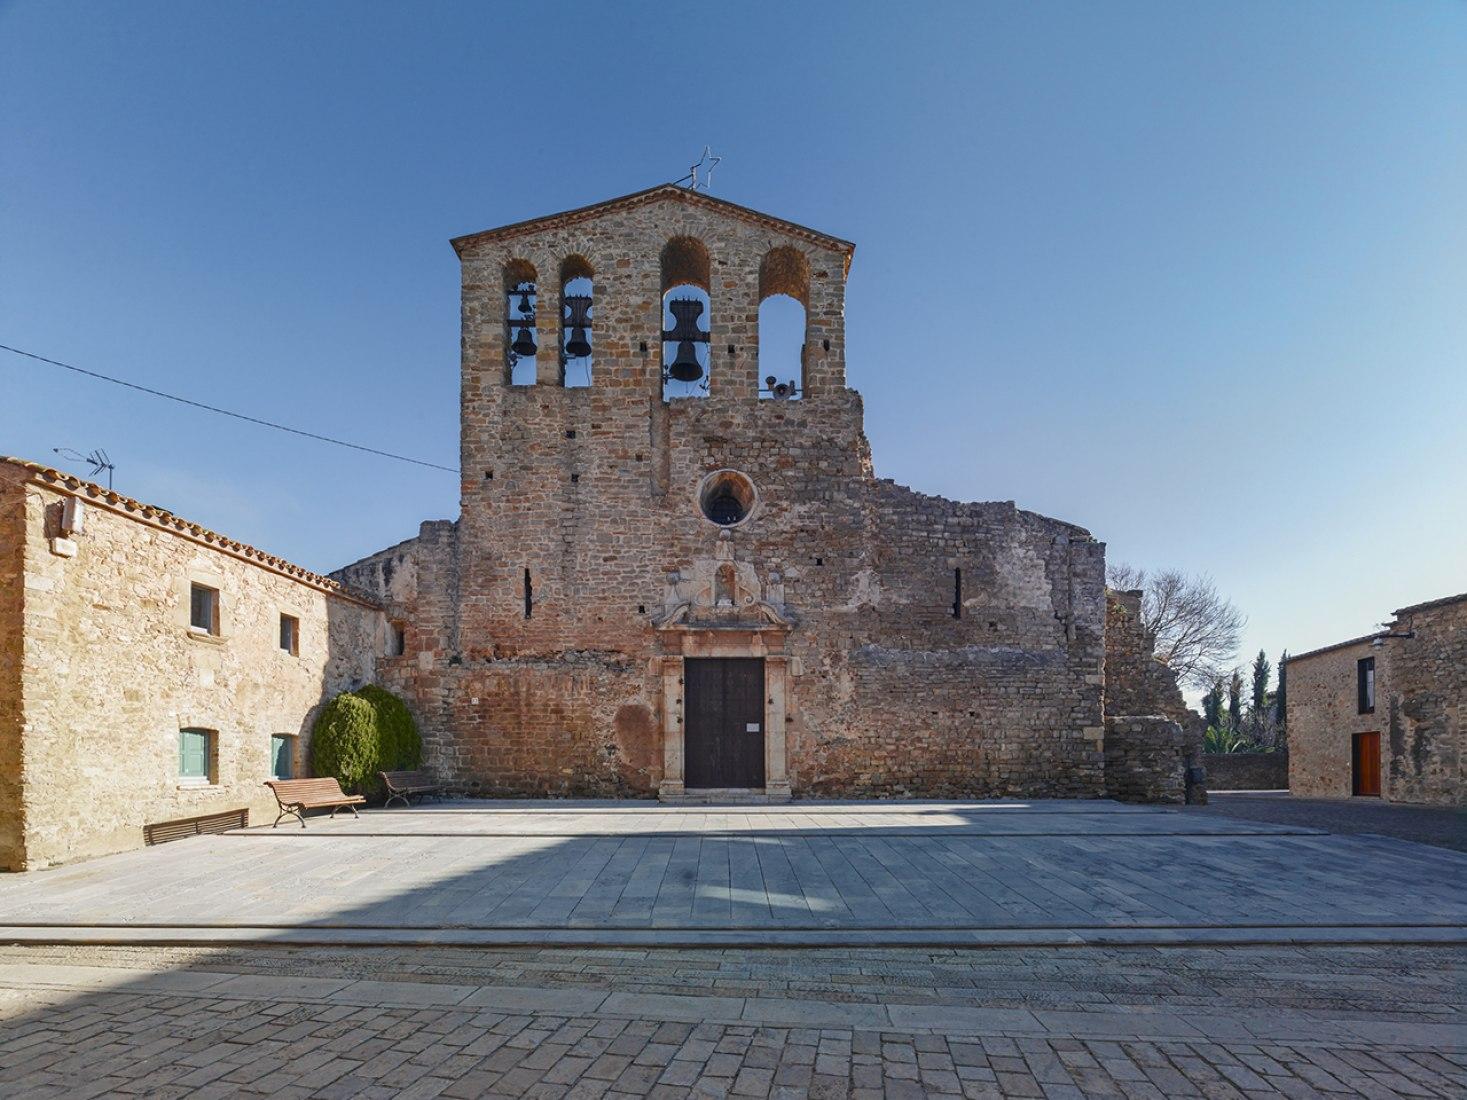 Mateo Arquitectura. Ullastret revisitado por Jordi Bernadó.